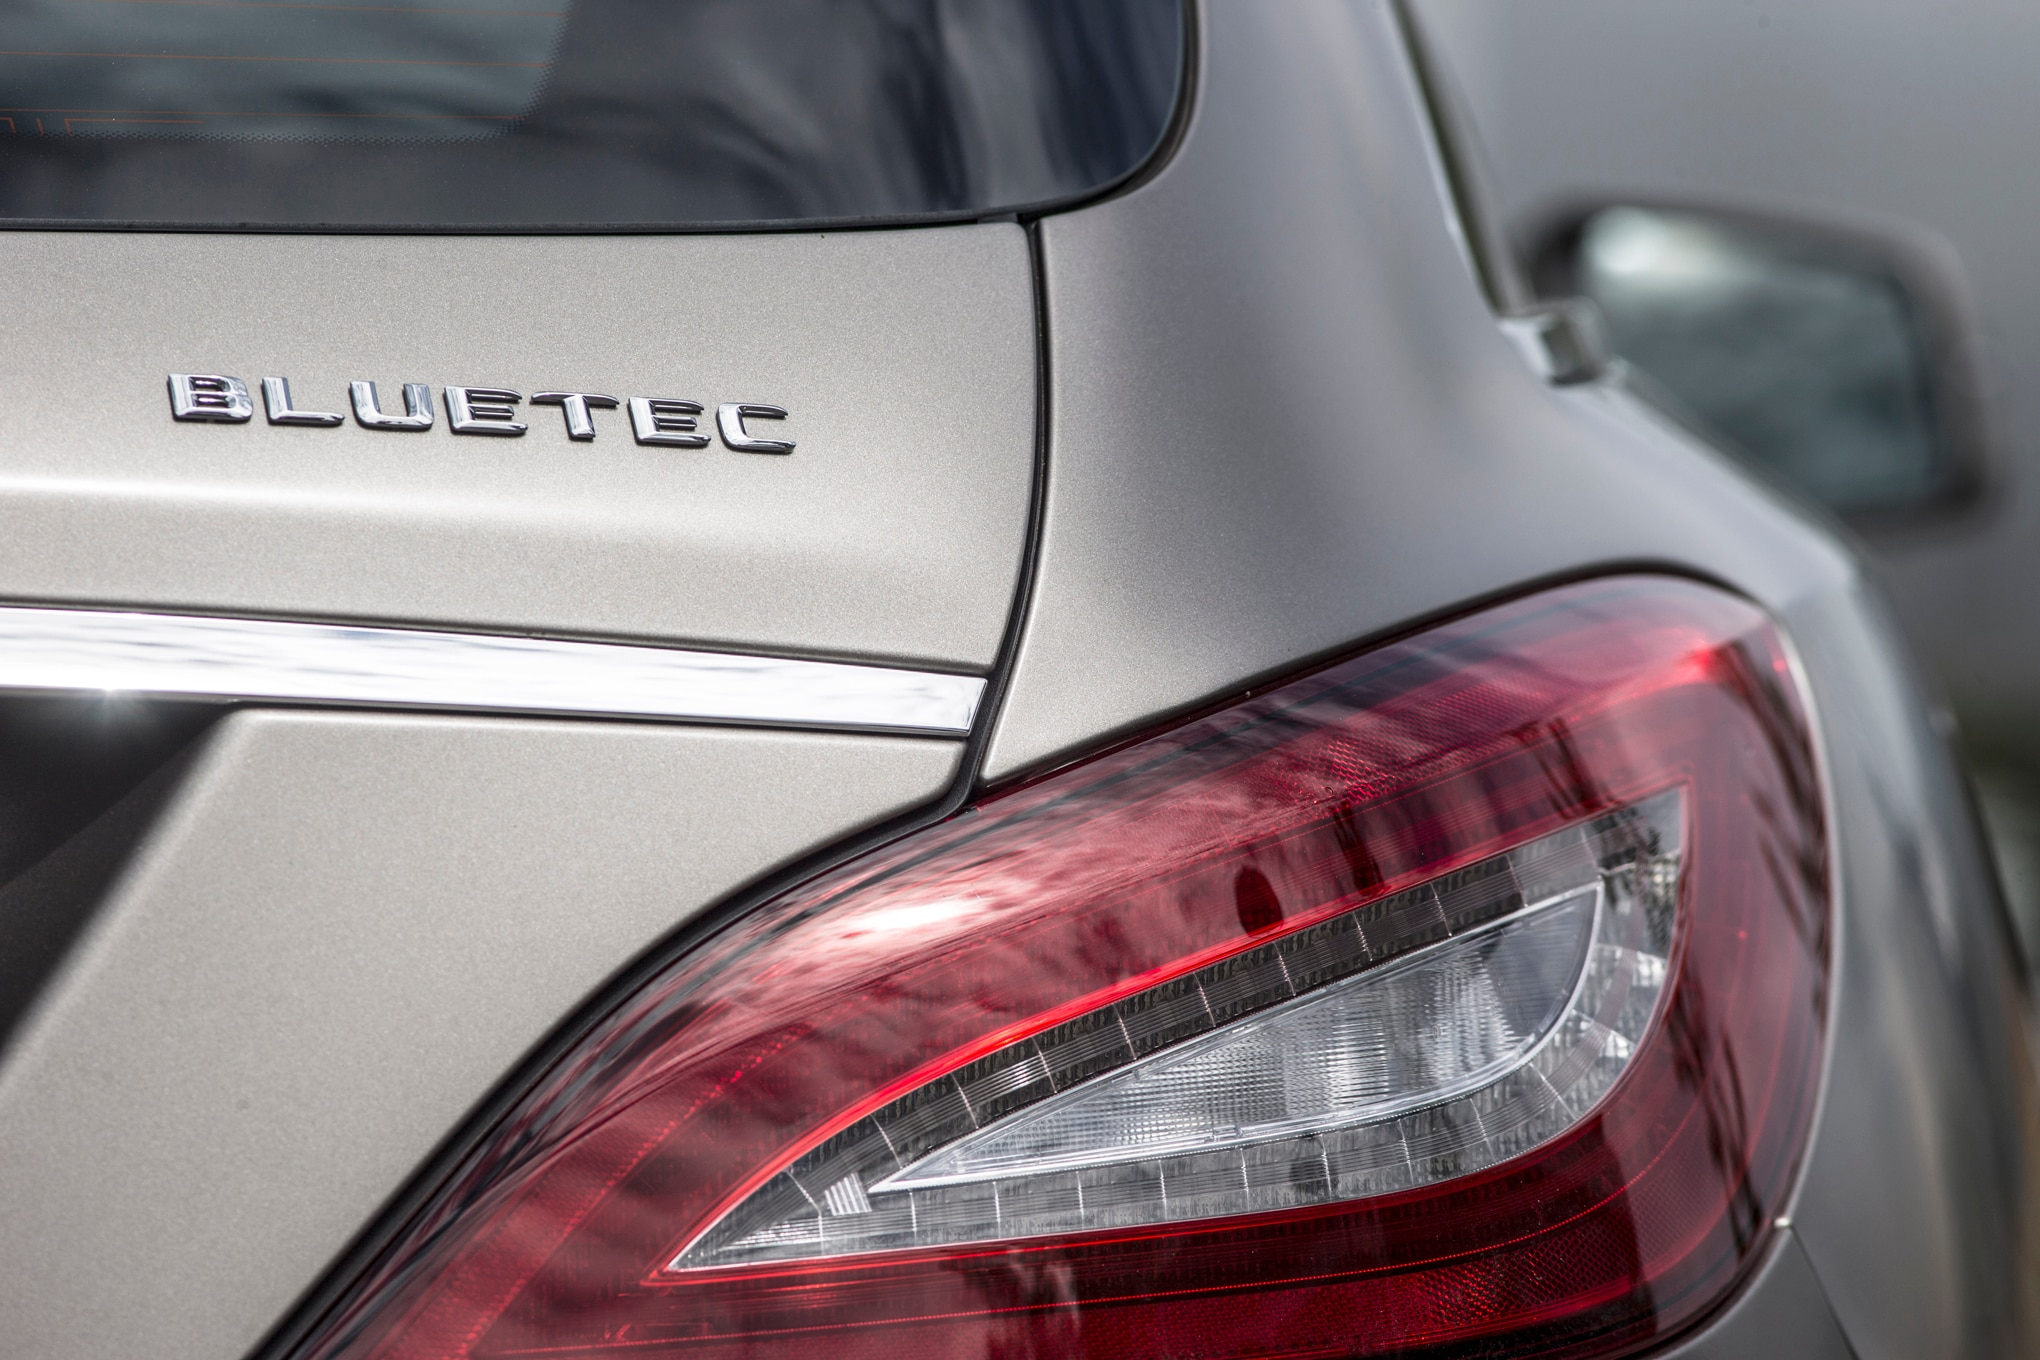 Report mercedes benz diesel owners file lawsuit regarding for Mercedes benz badge